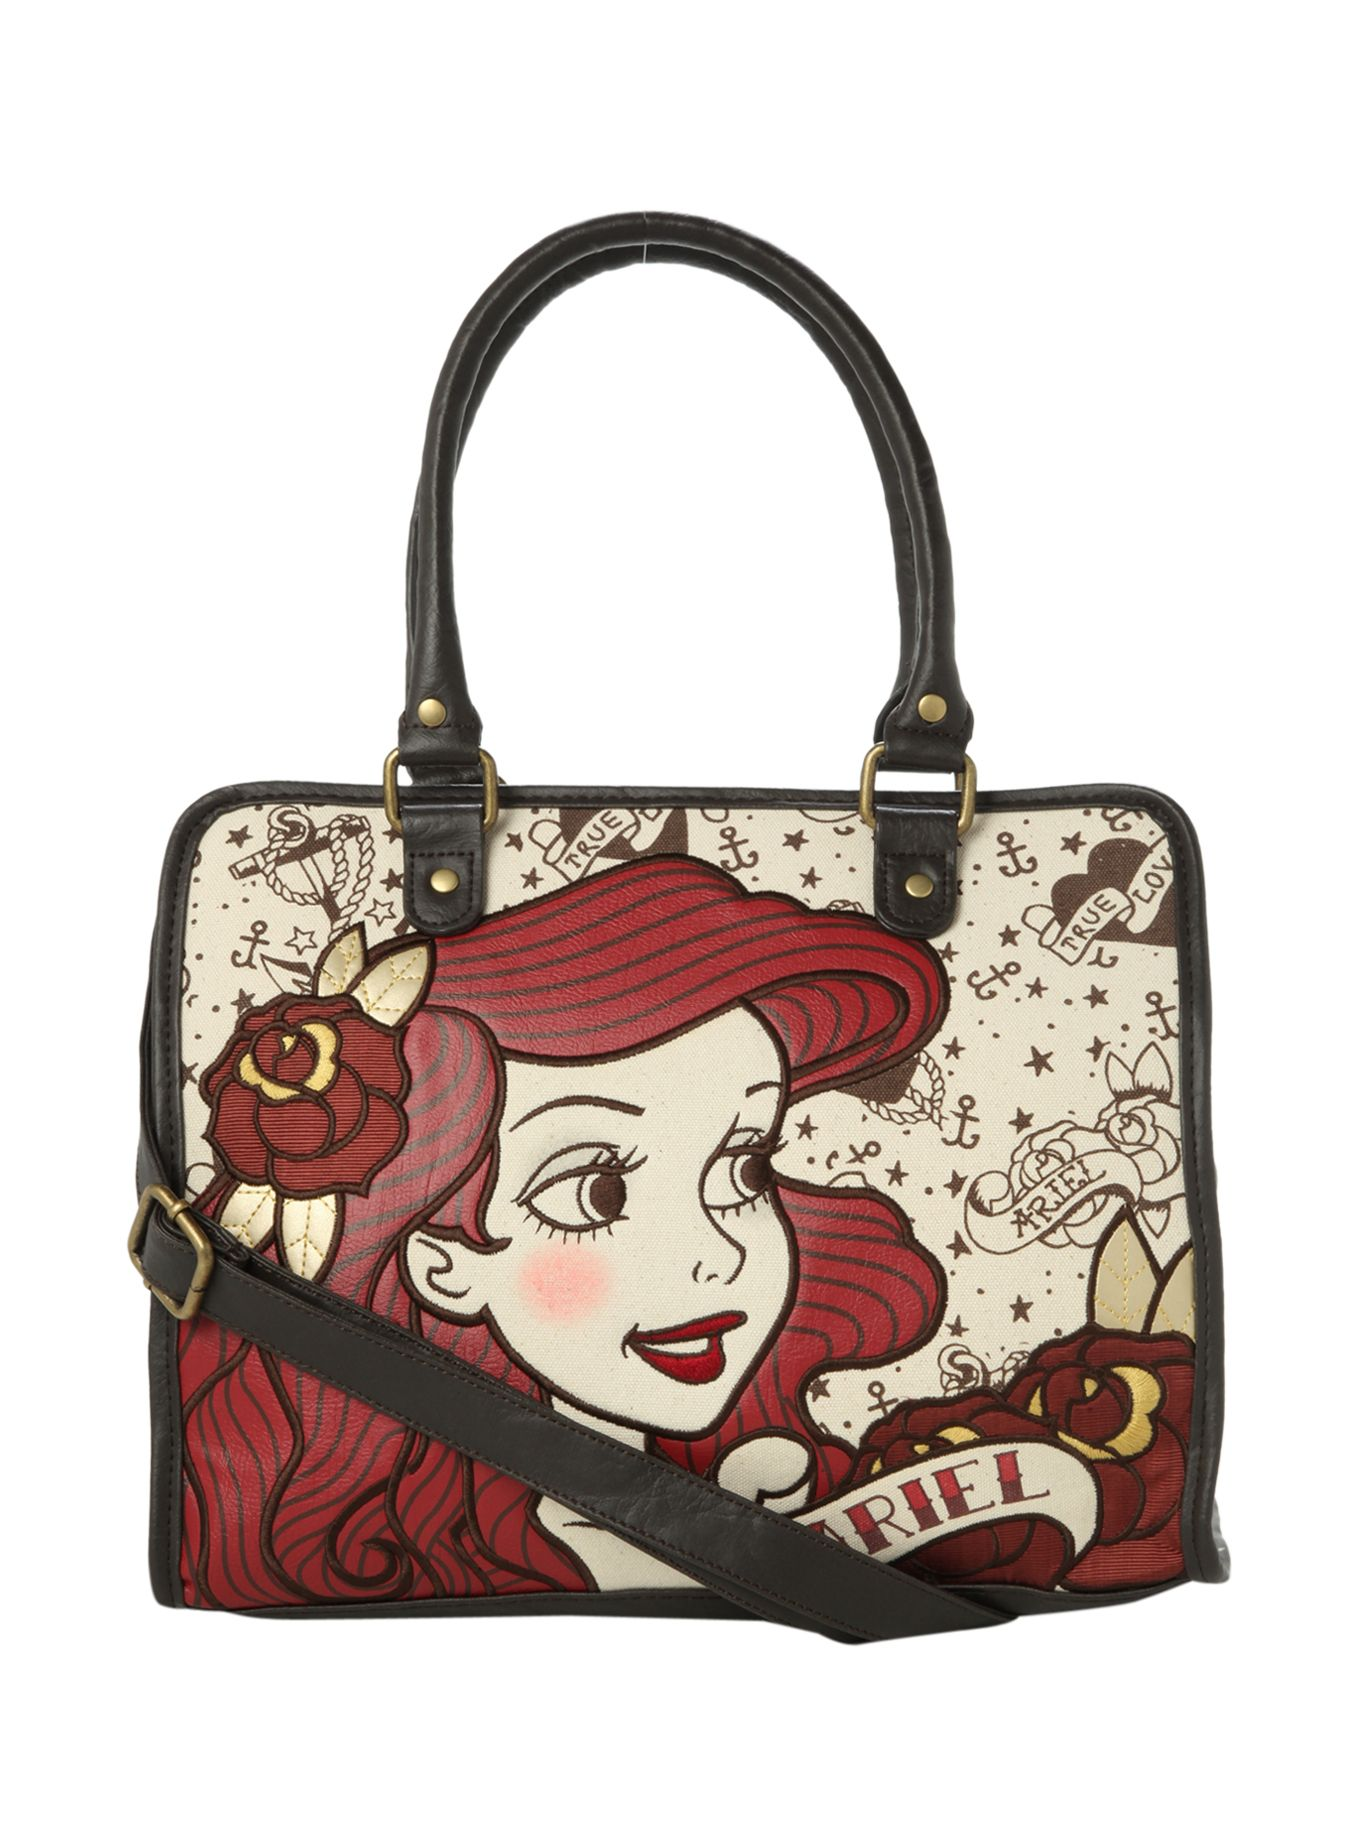 Disney The Little Mermaid Tattoo Ariel Bag Hot Topic 44 63